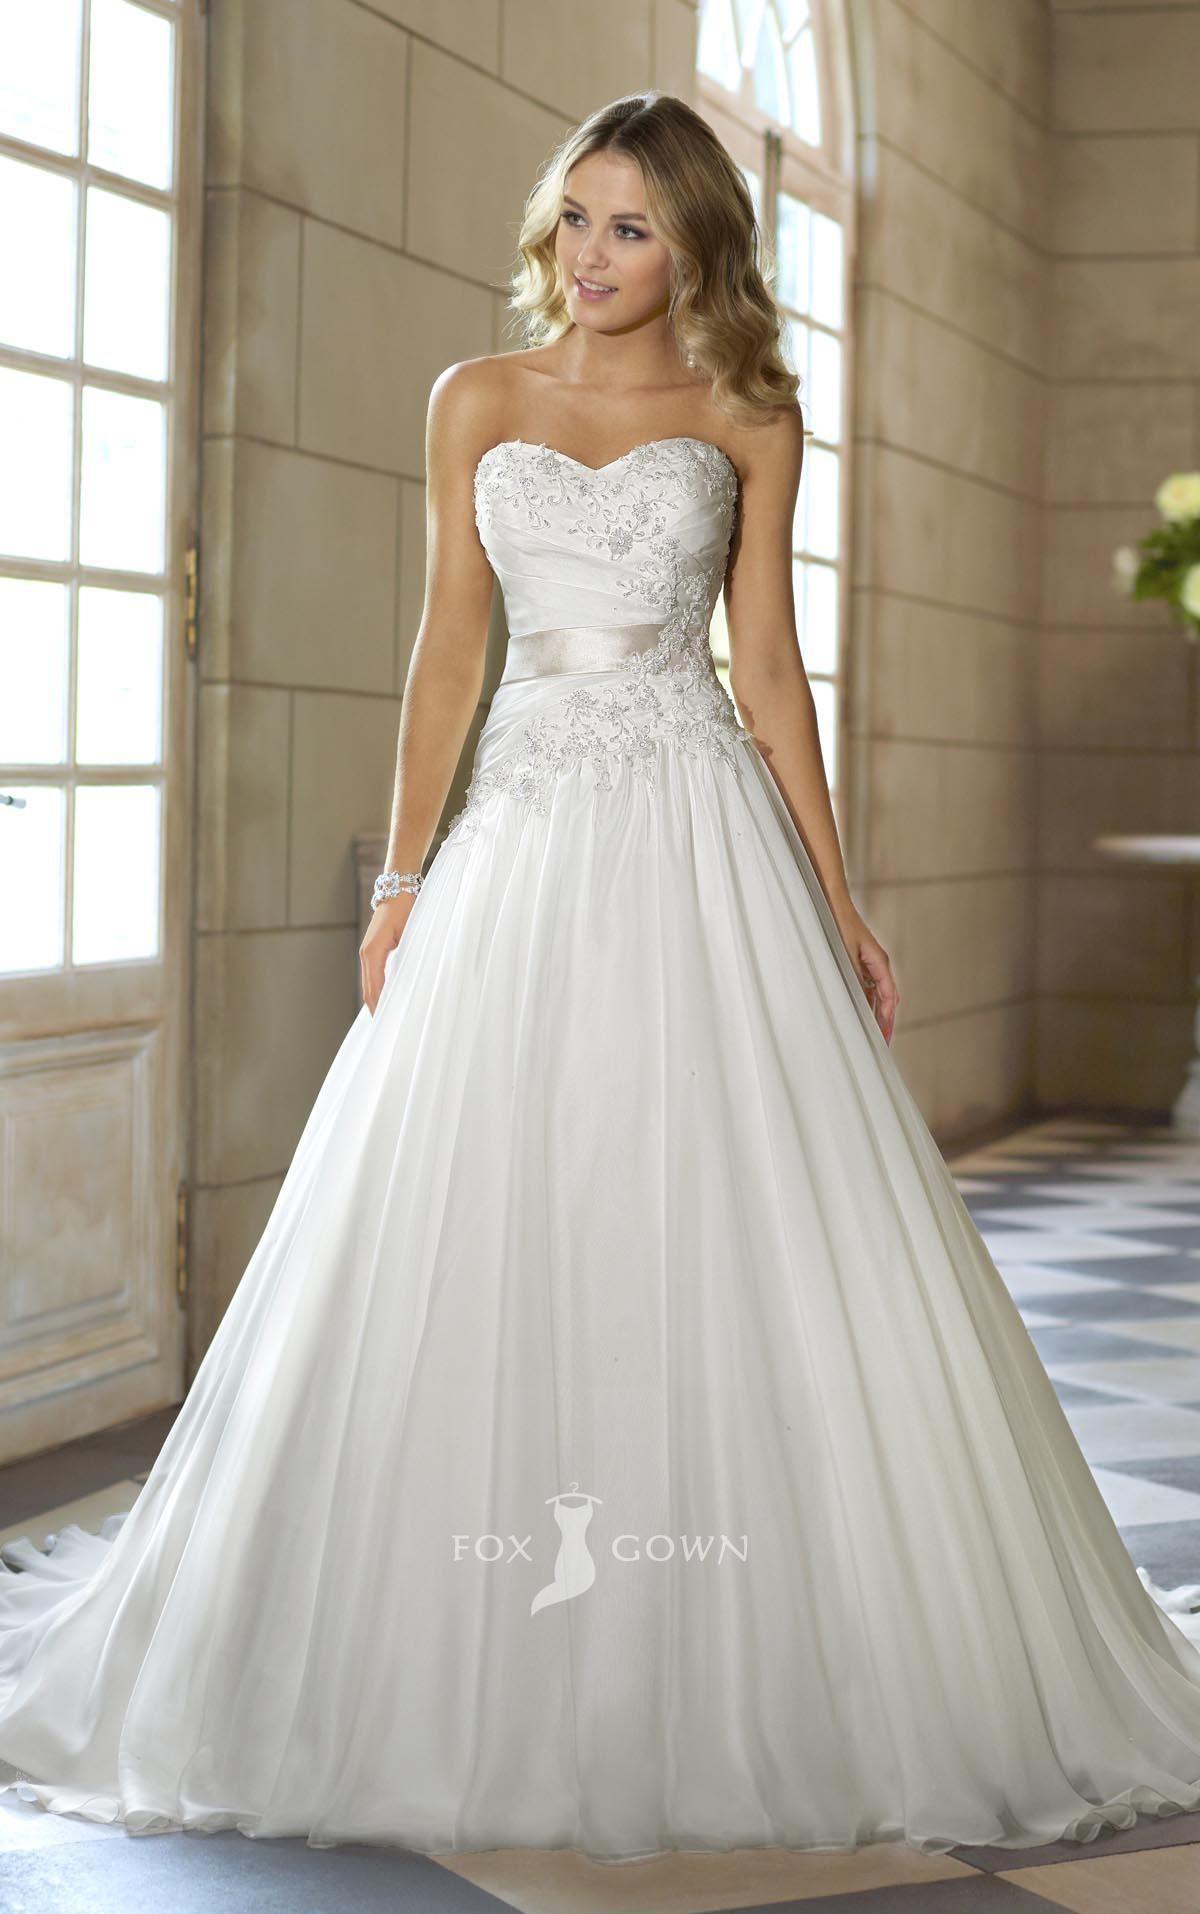 Lace A Line Illusion Neckline Wedding Dress